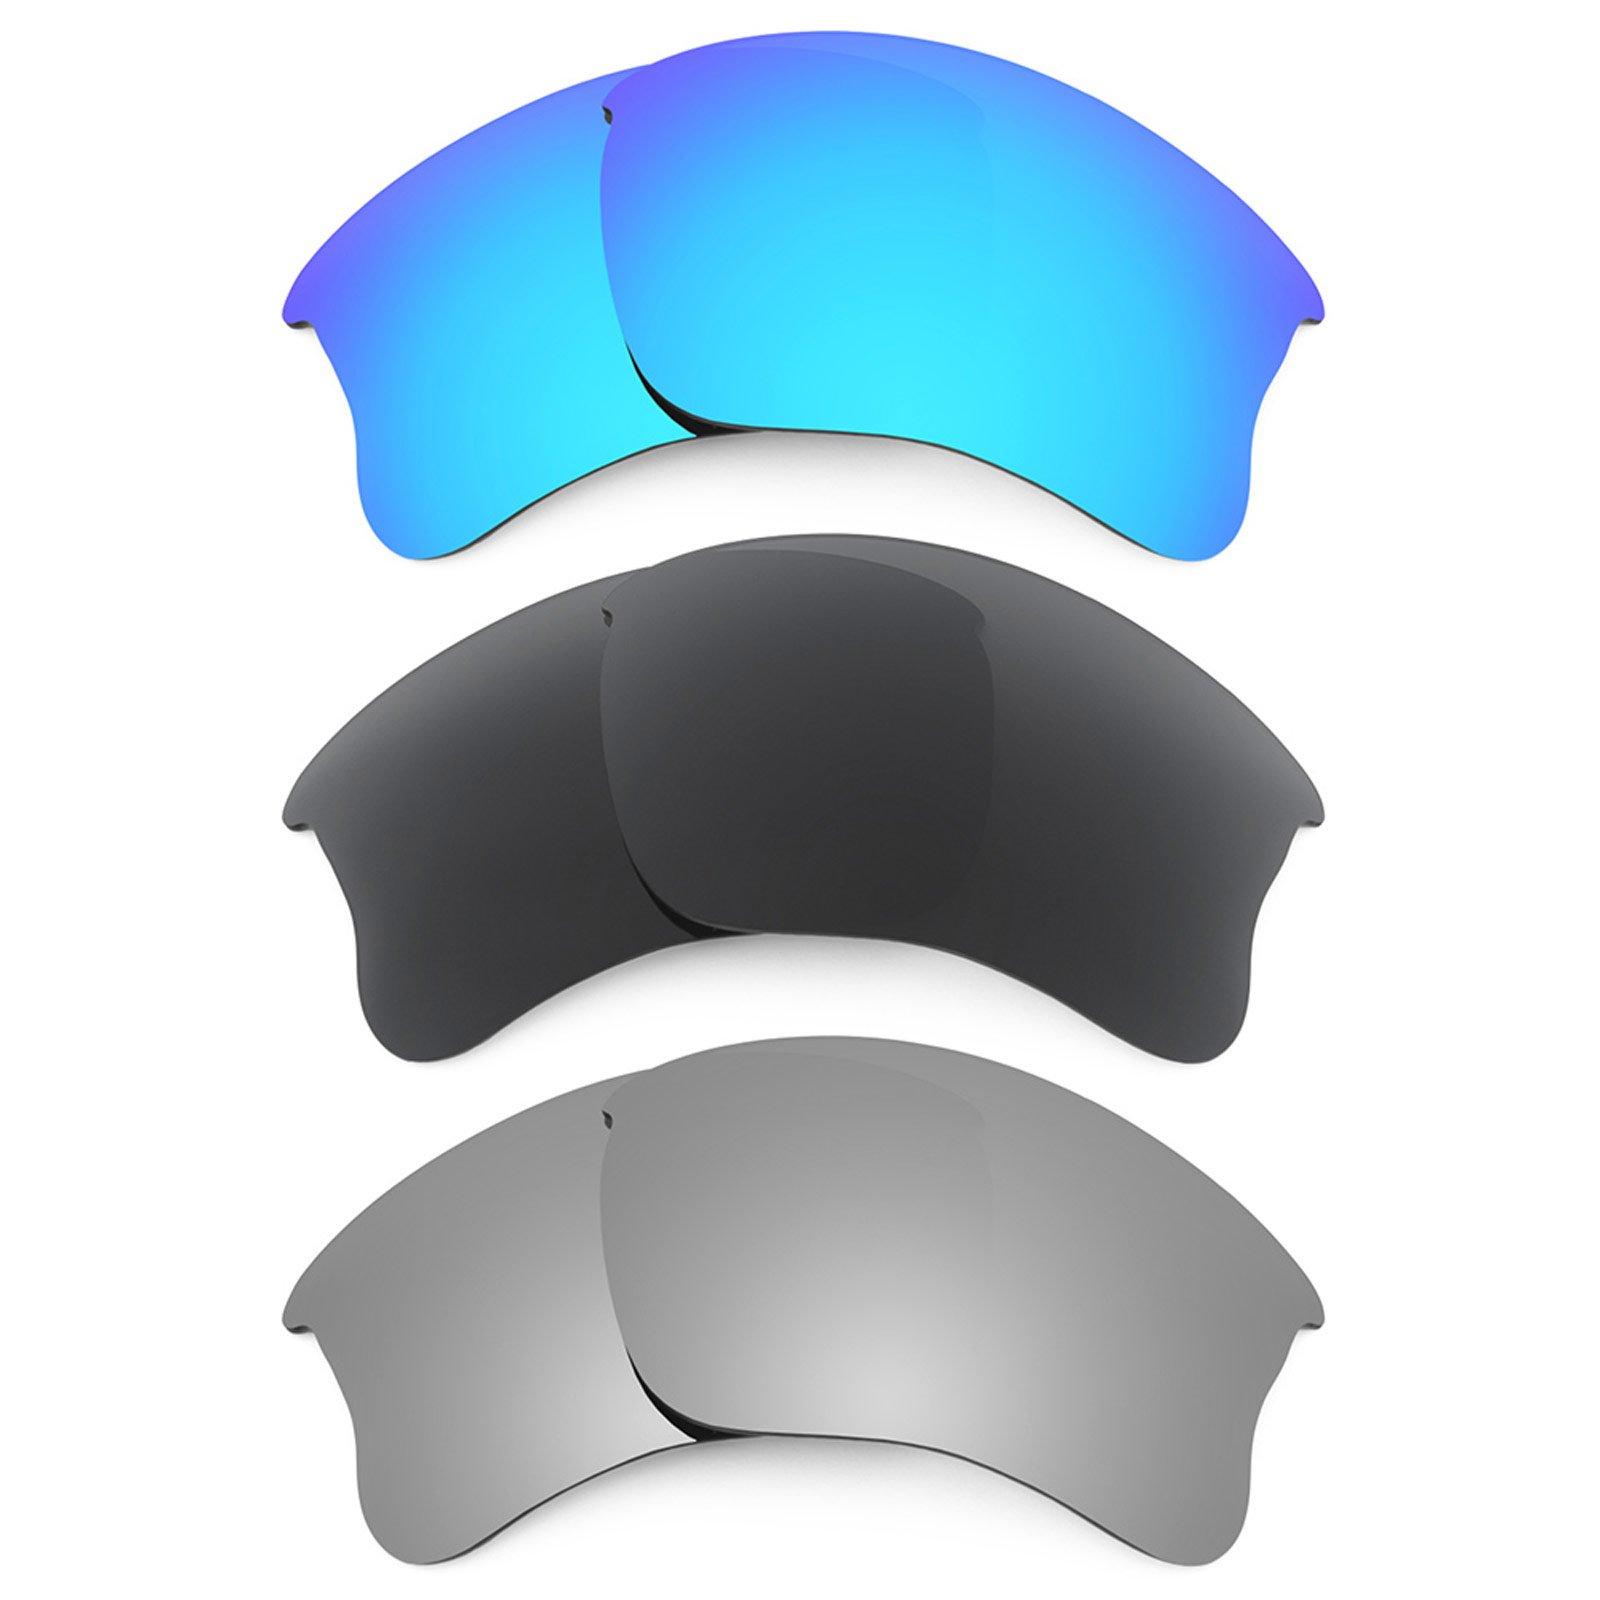 Revant Replacement Lenses for Oakley Flak Jacket XLJ 3 Pair Combo Pack K015